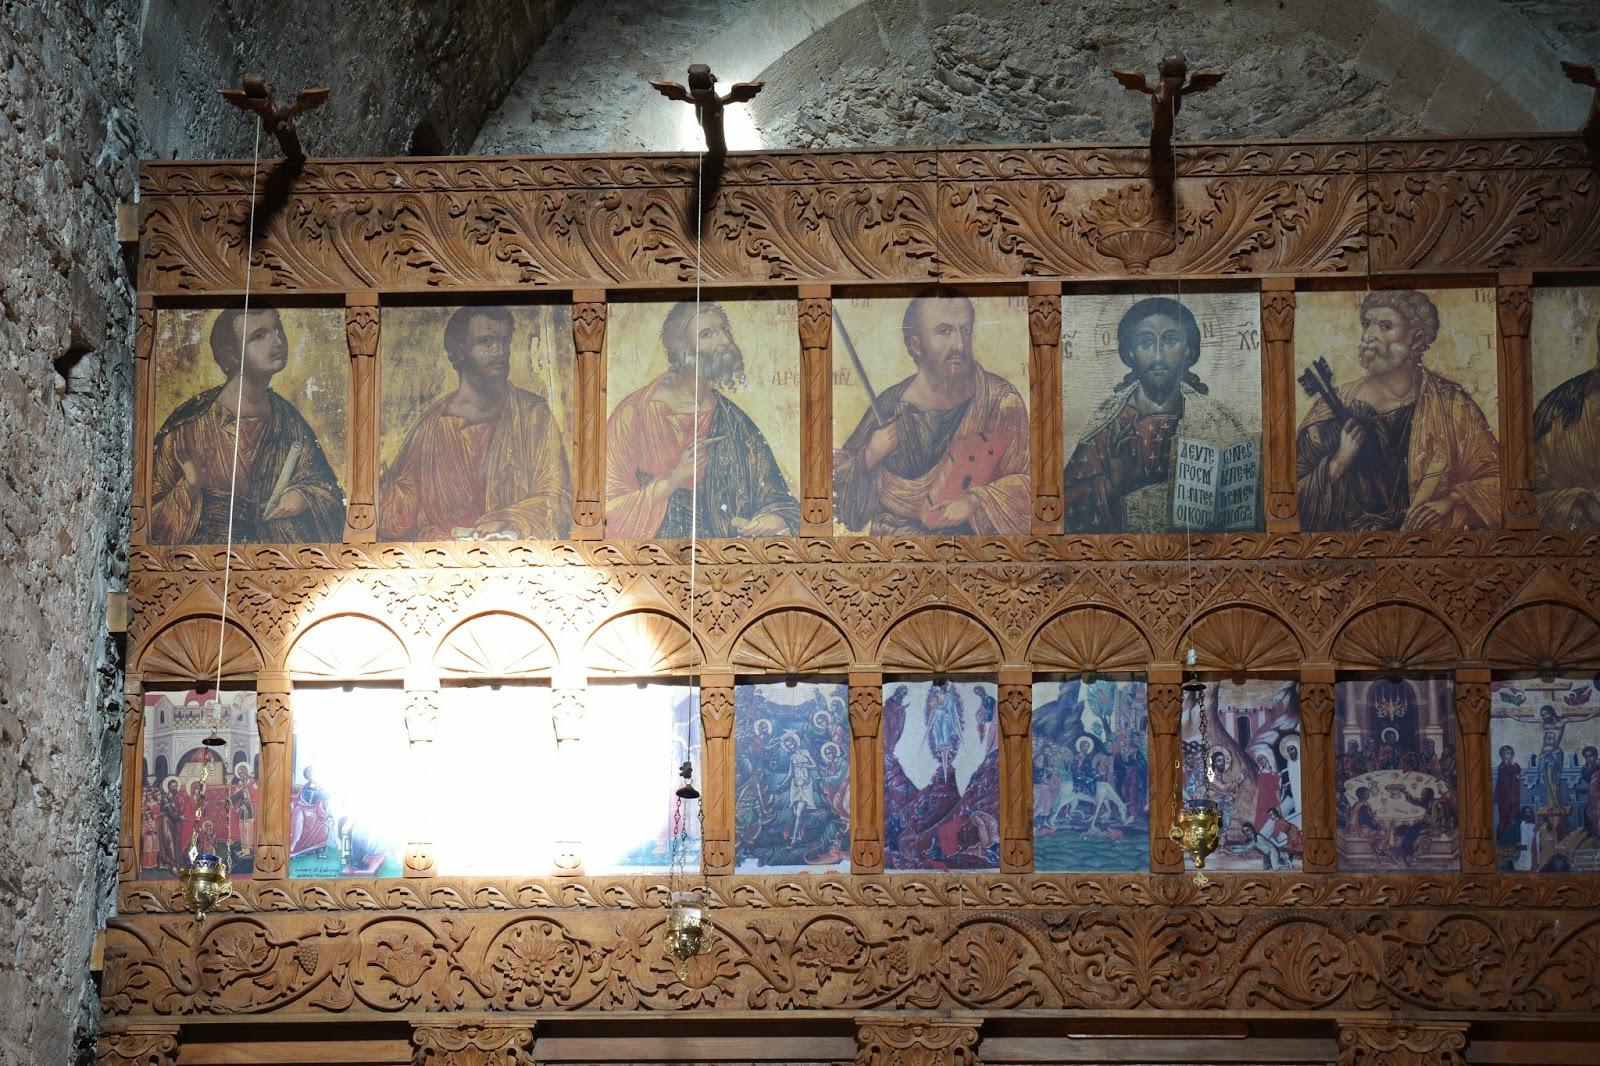 SecretCyprusTravel Images inside the Monastery of